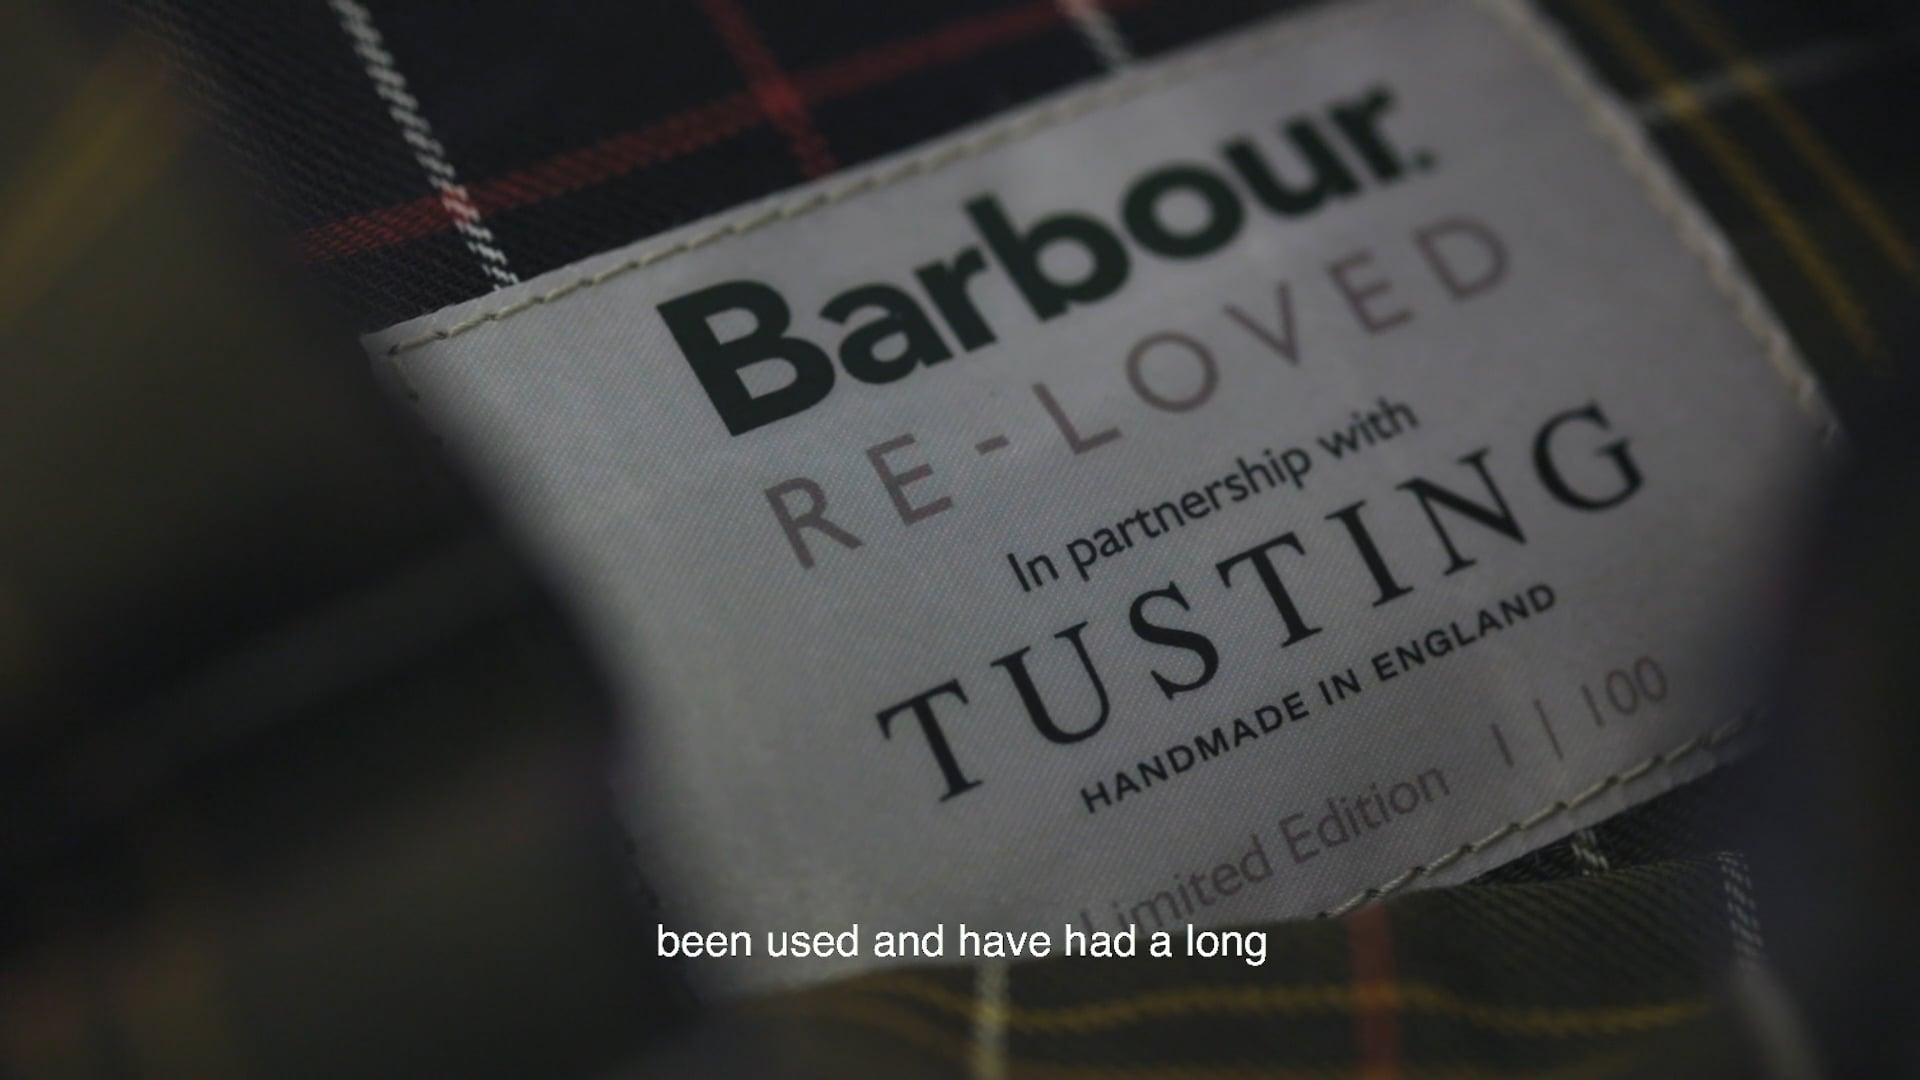 Tusting x Barbour Re-Loved